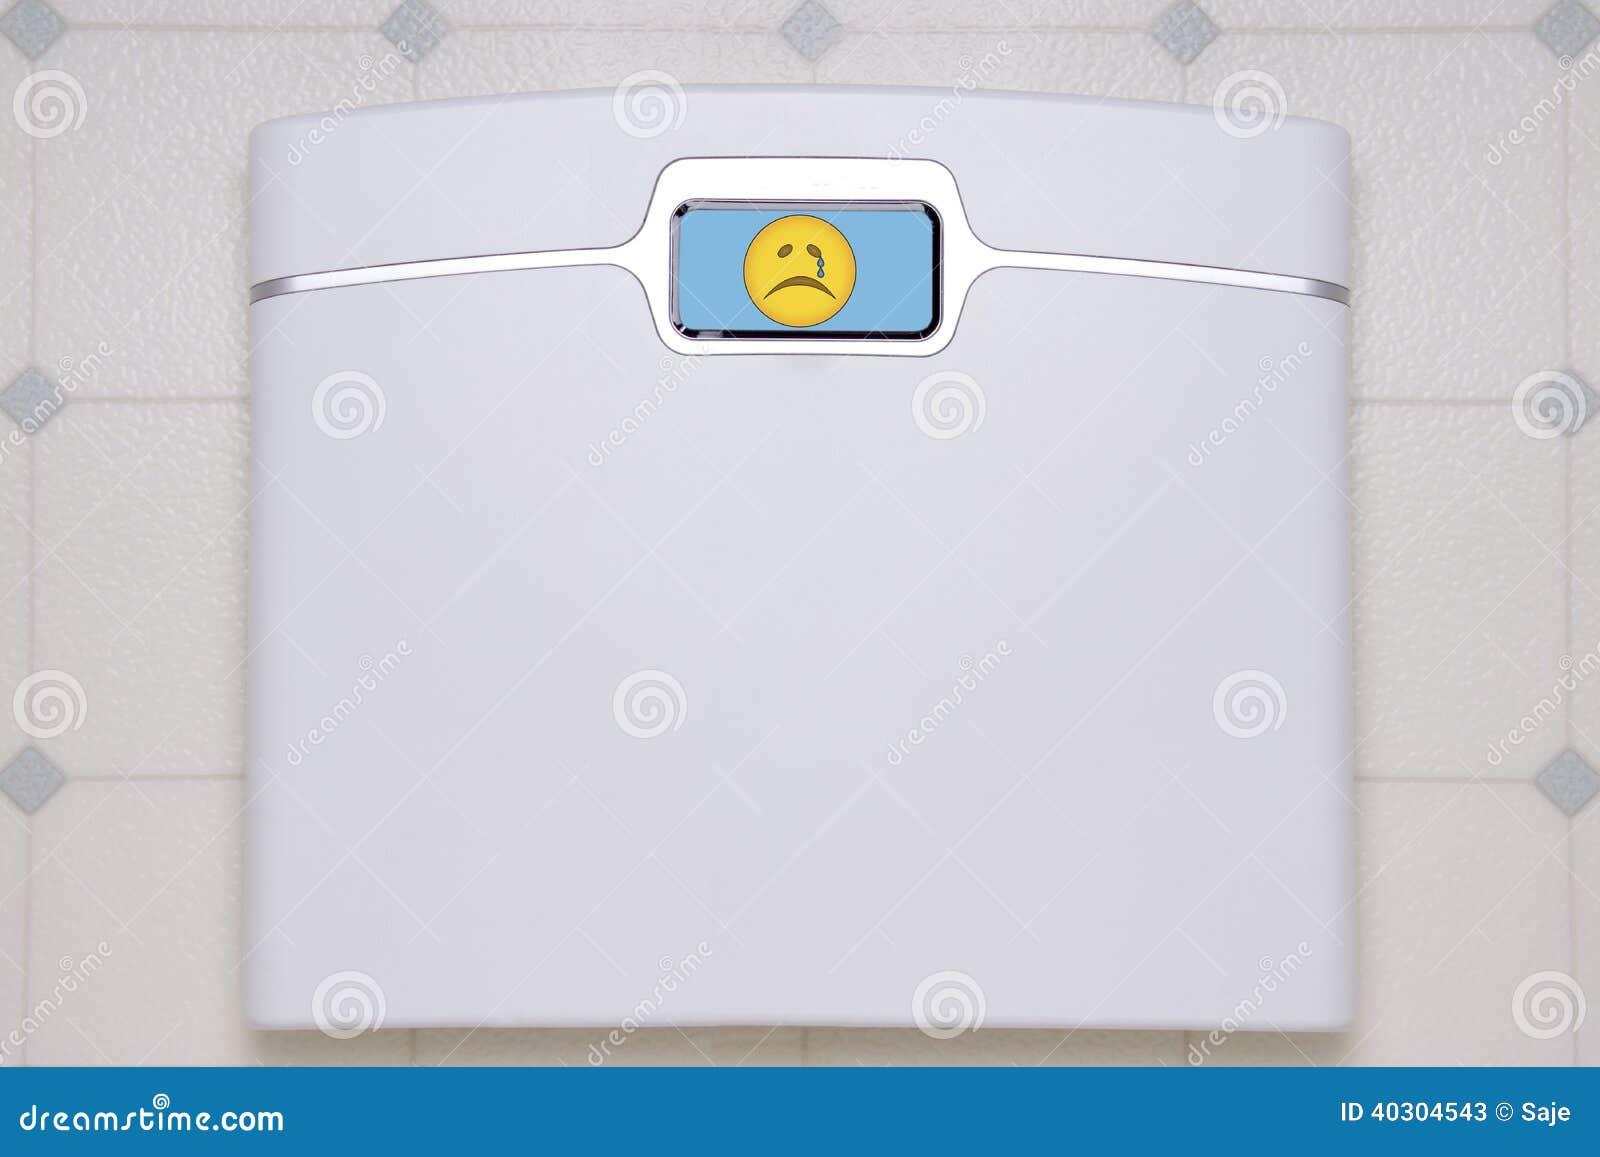 Bathroom Emoji Toilet Sticker WC Pedestal Pan Cover Stool